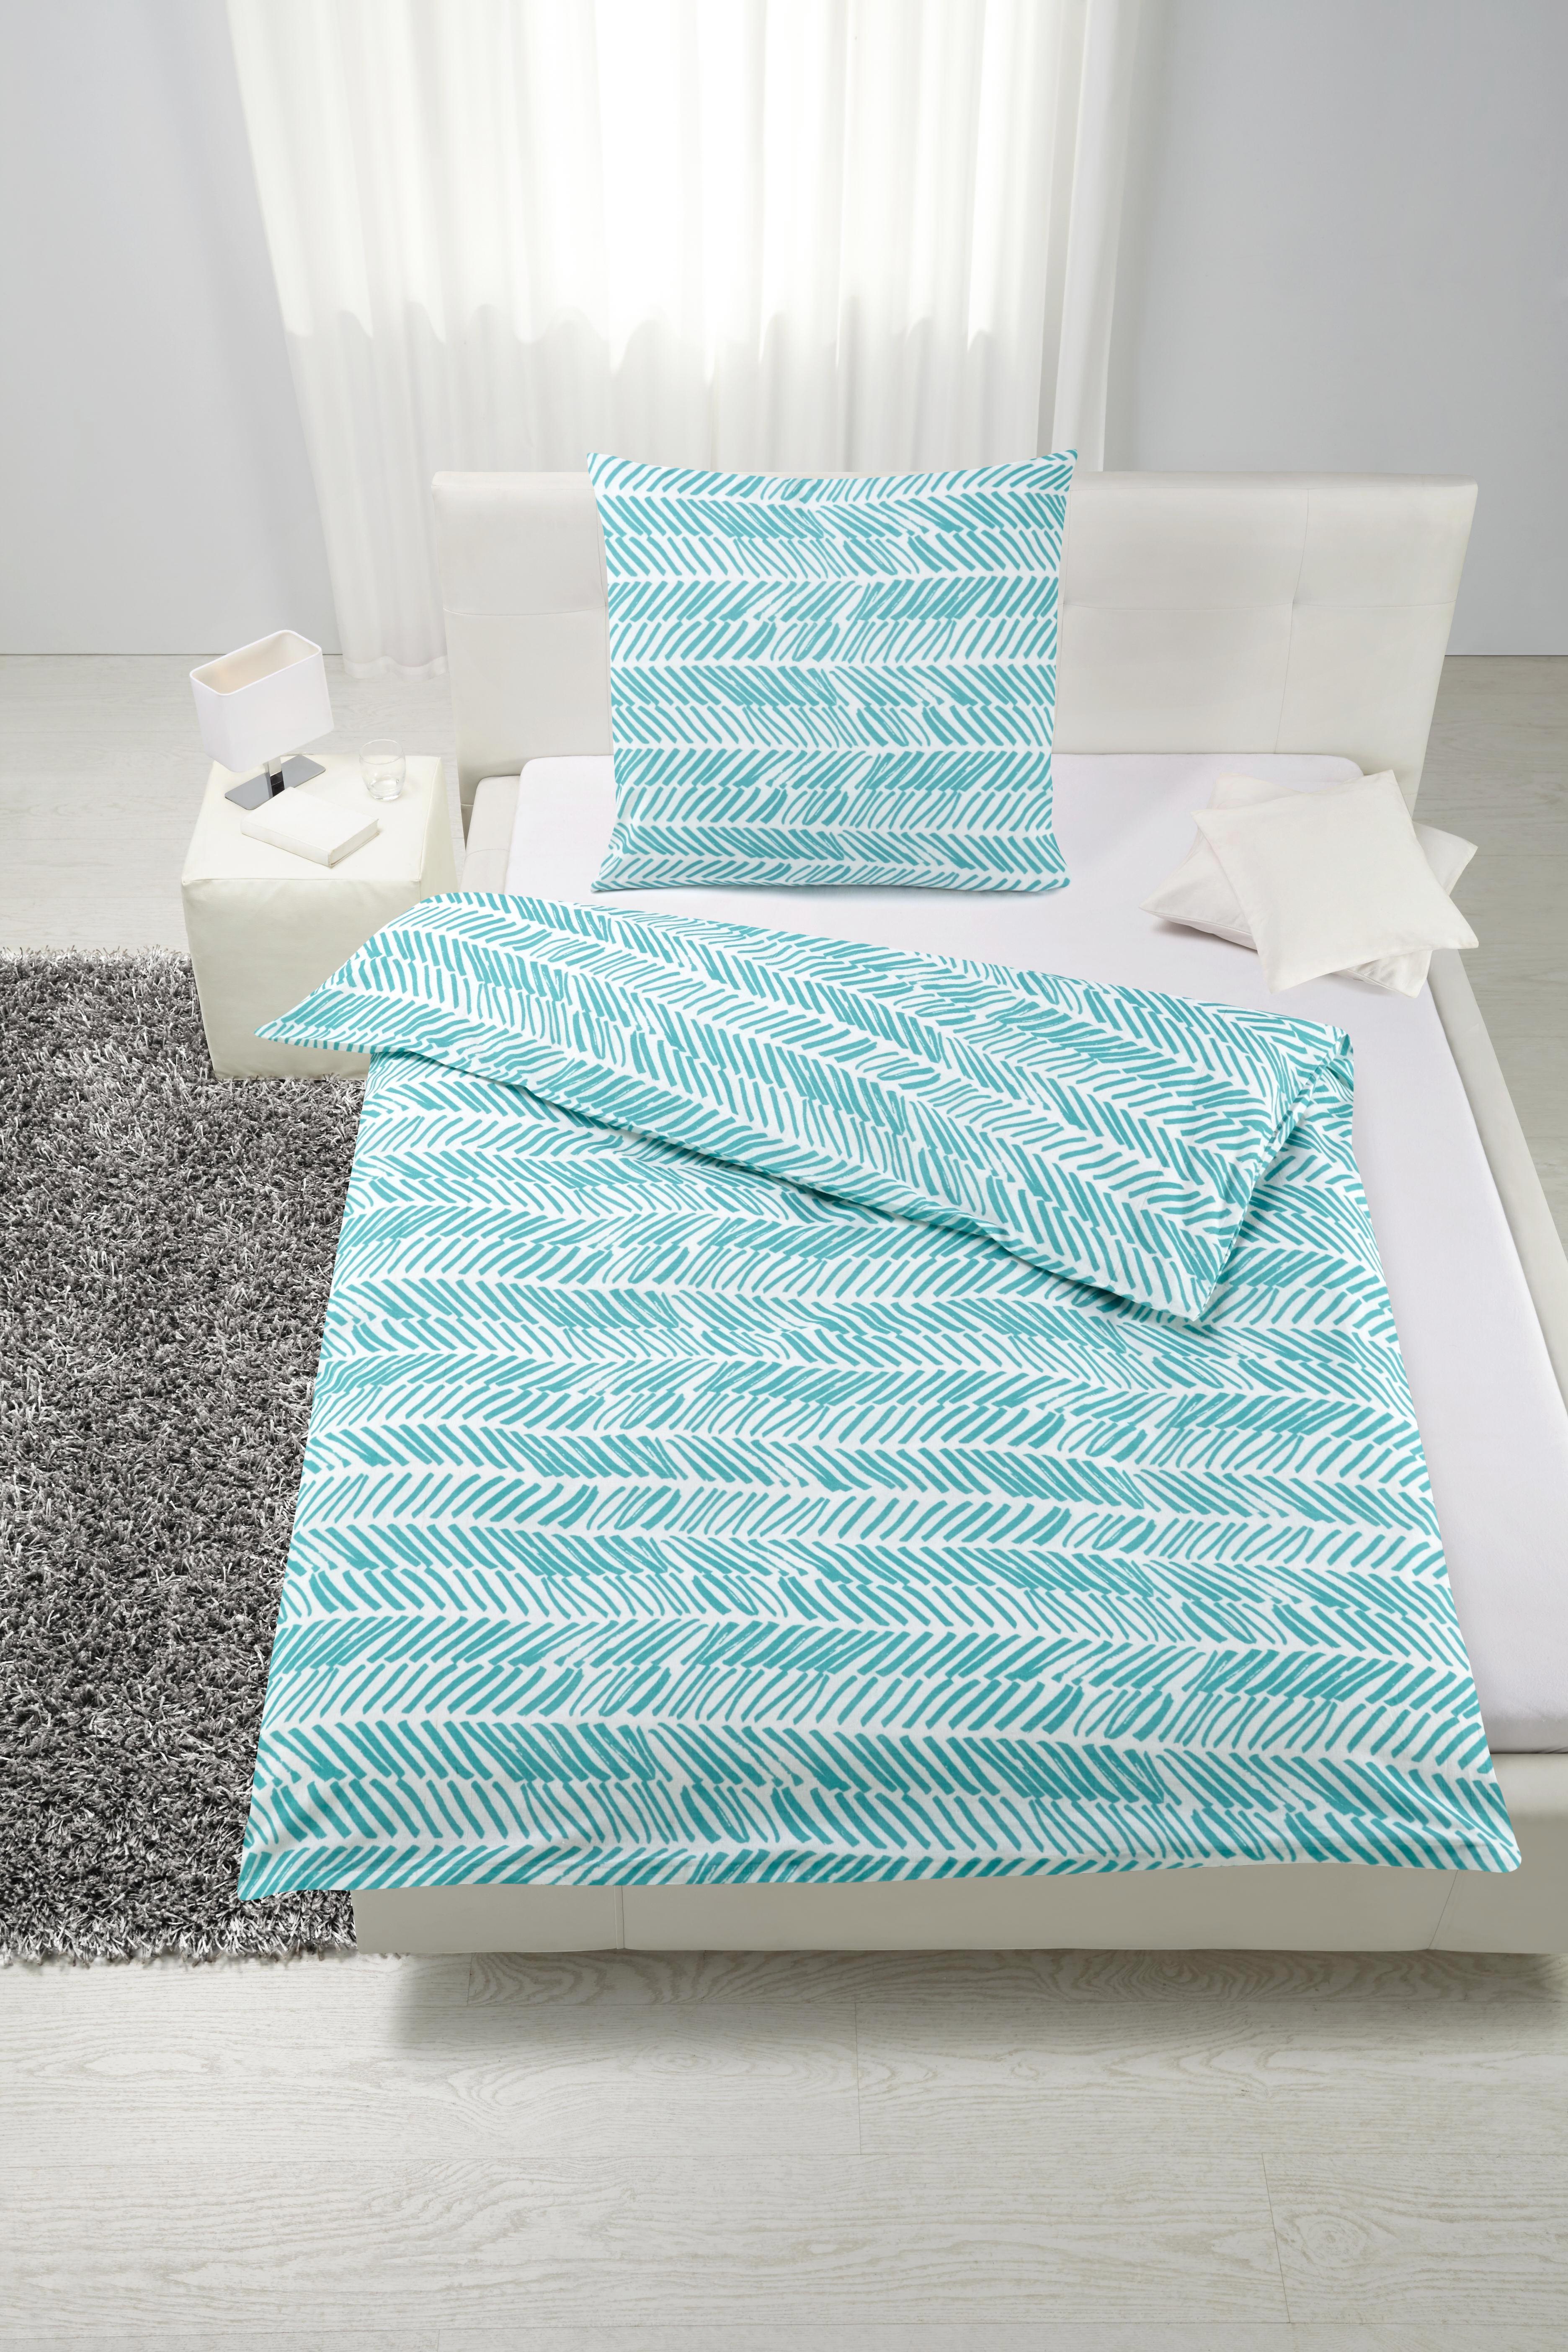 Bettwäsche Nadine ca. 135x200cm - Blau/Grau, Textil (135/200cm) - BASED